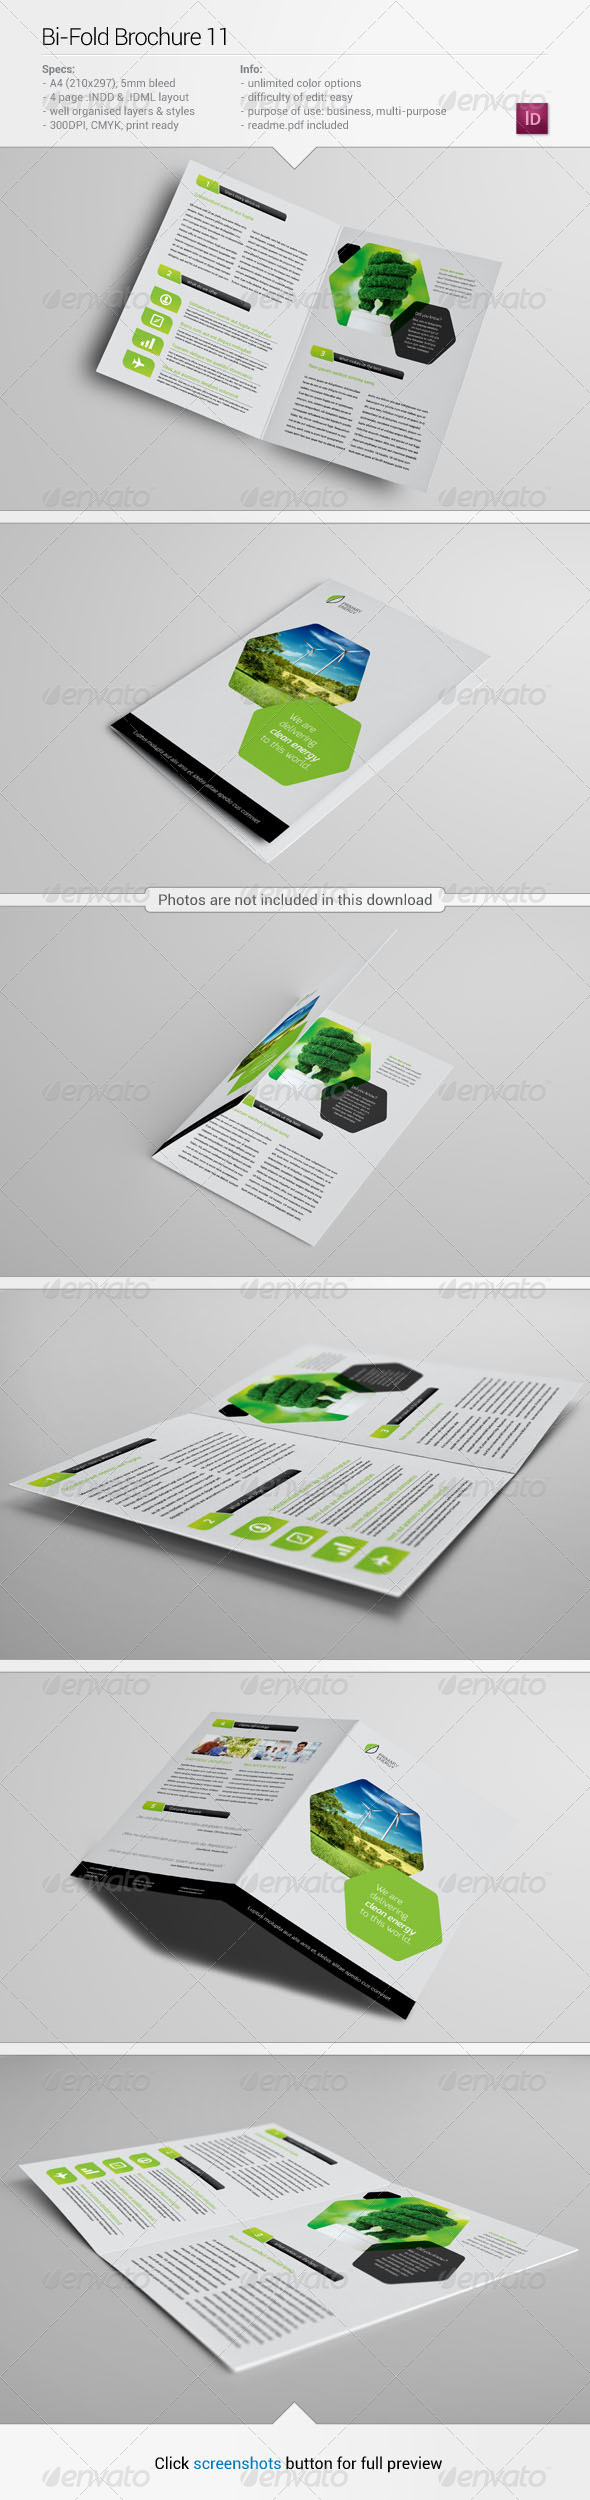 GraphicRiver Bi-Fold Brochure 11 5546595